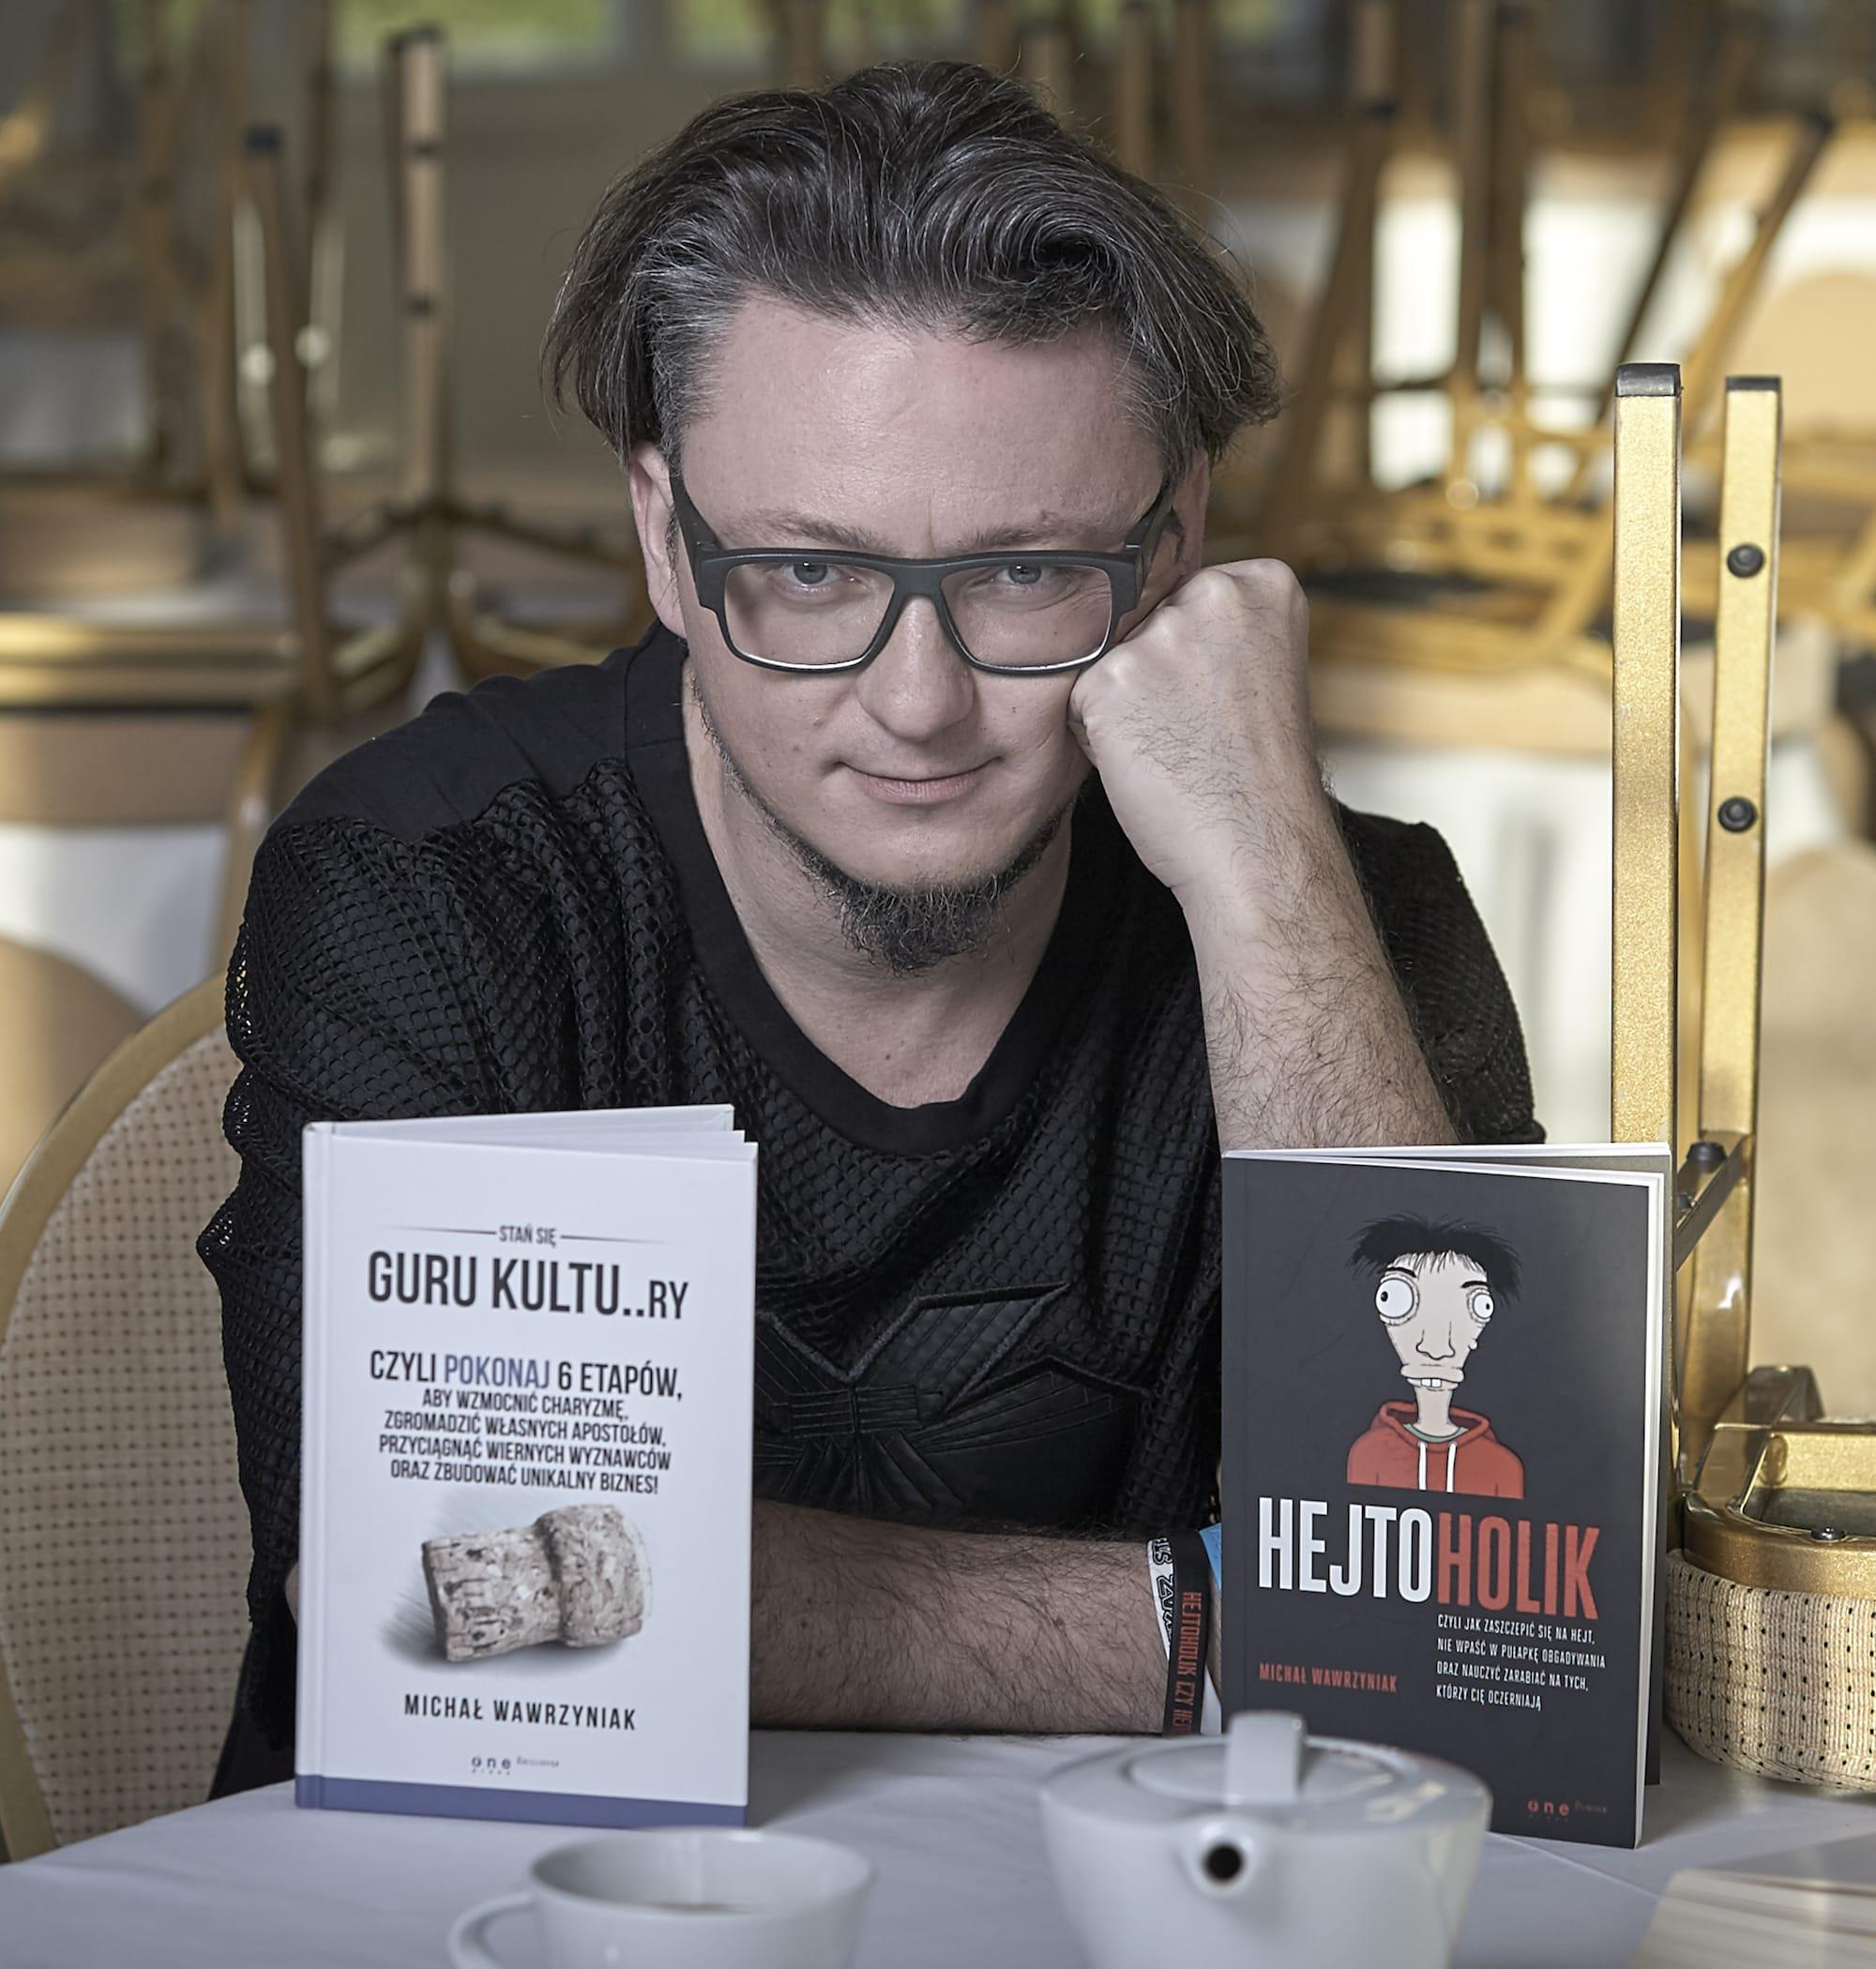 Bestsellerowe-ksiazki_Michala-Wawrzyniaka-Guru-Kultury-oraz-Hejtoholik